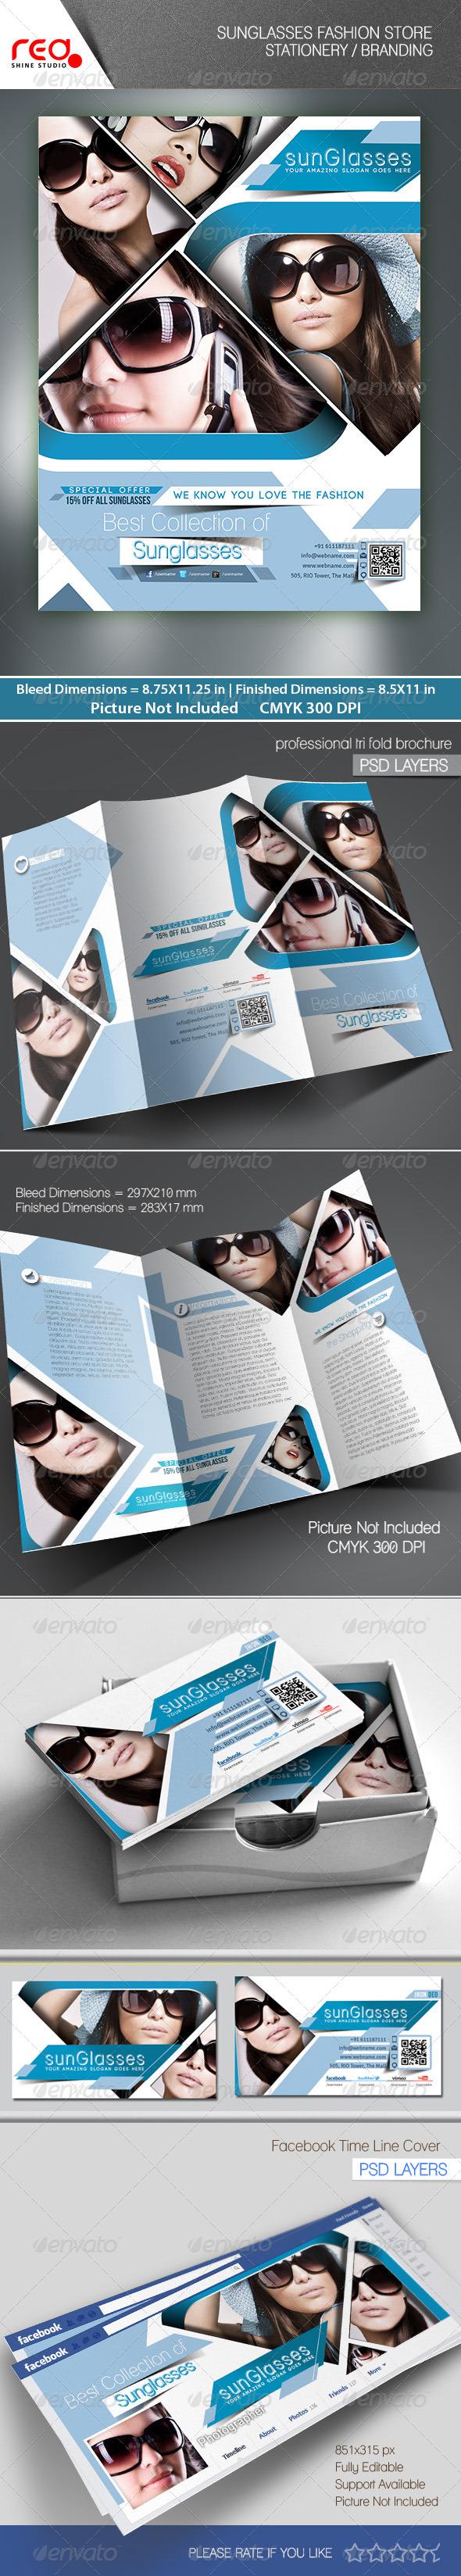 SunGlasses Fashion Store Branding Bundle - Corporate Brochures